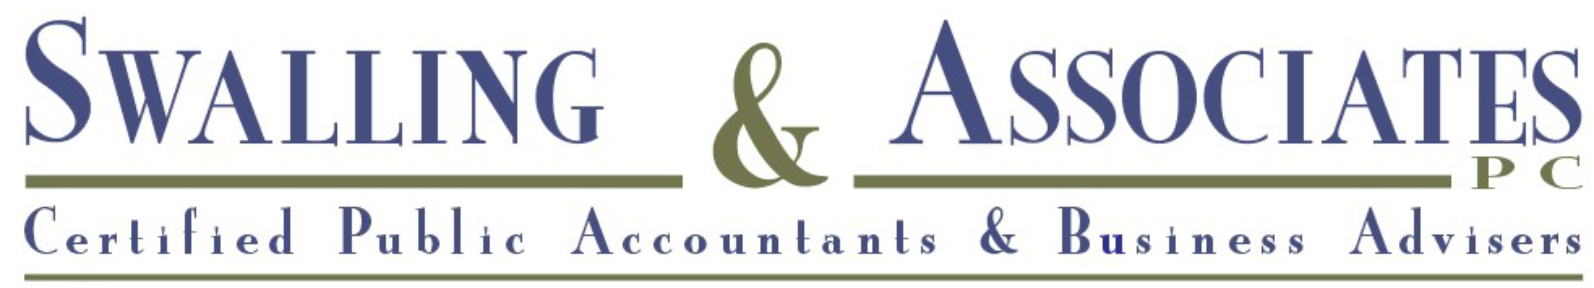 Downhole Sponsors - $250 - Swalling & Associates - Logo